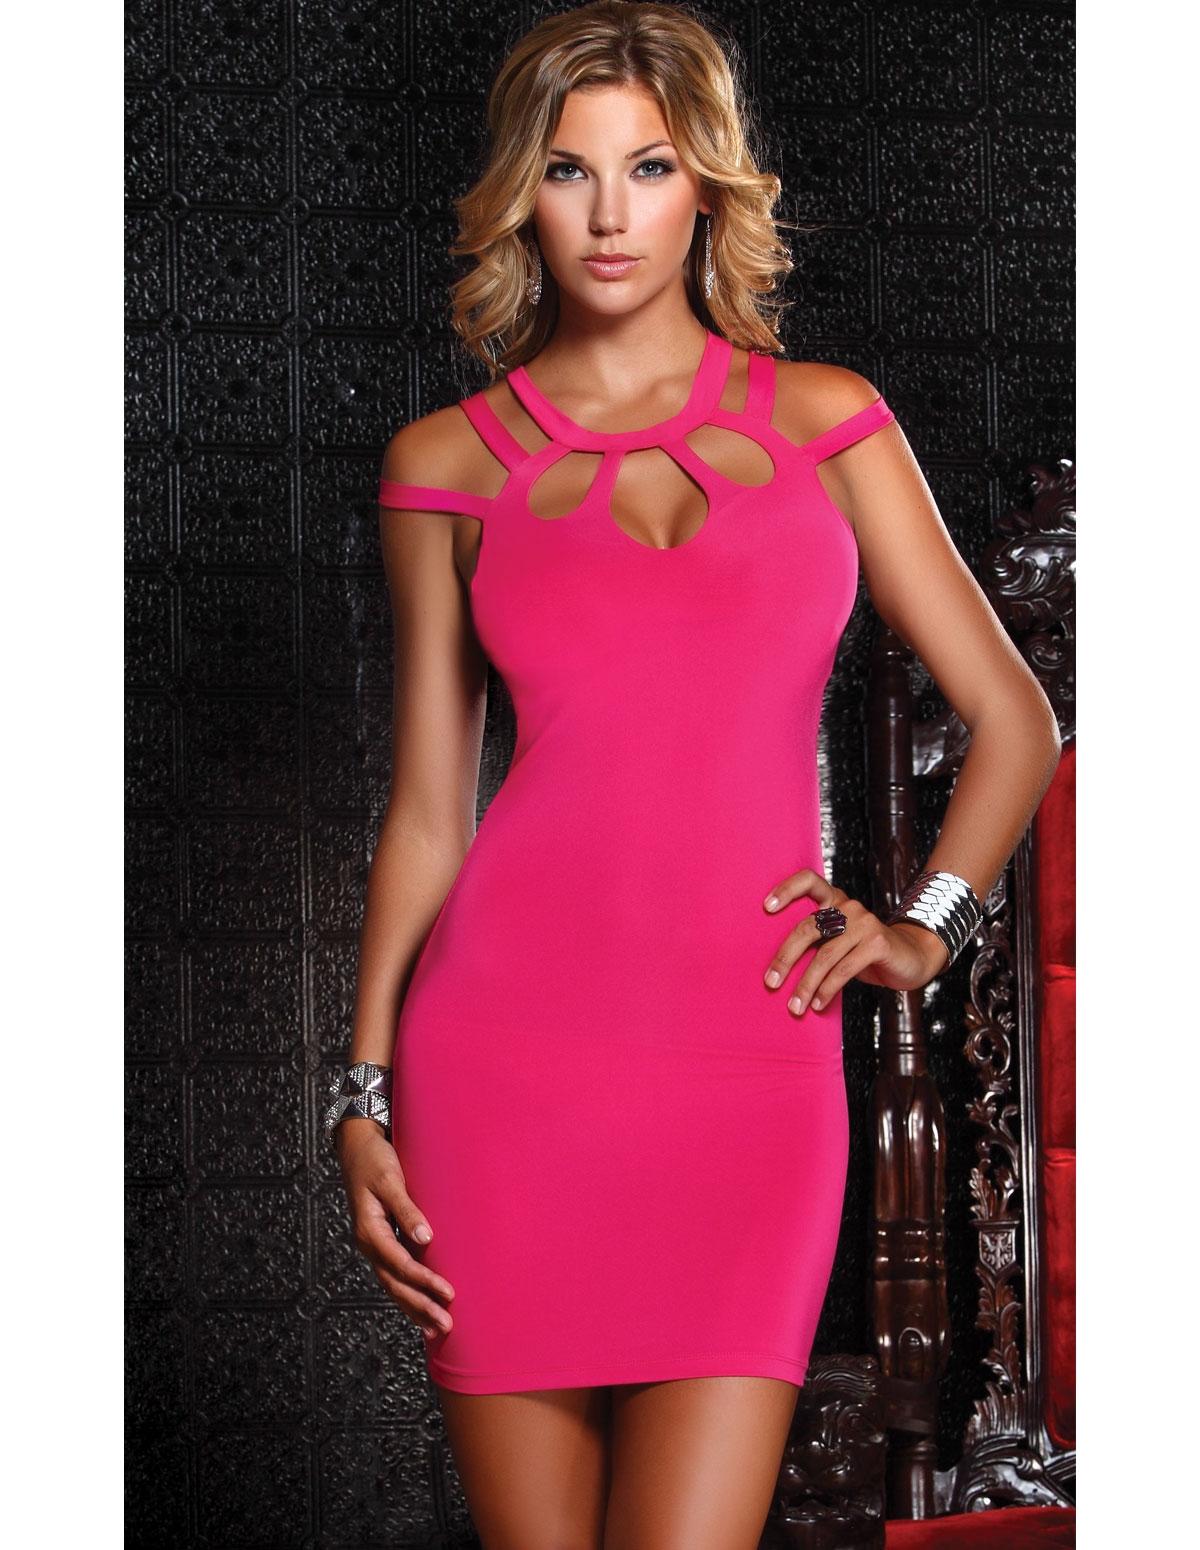 Pink Passion Dress